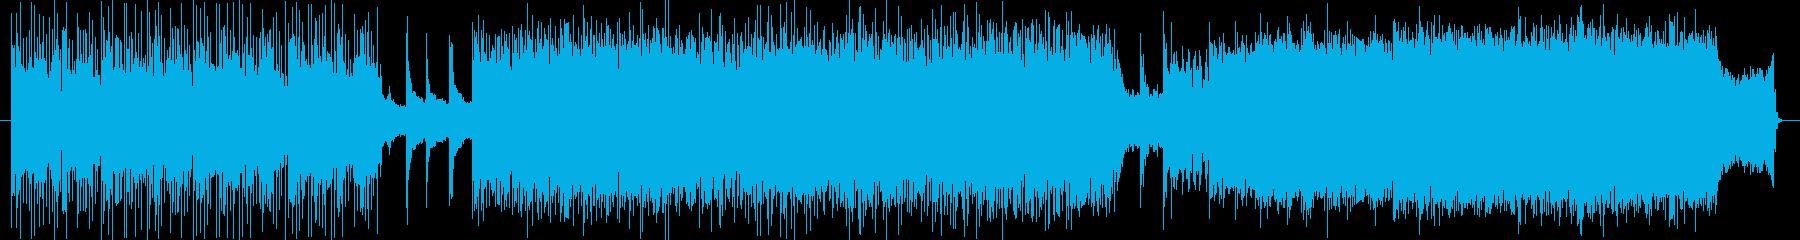 akanteの編曲版の再生済みの波形